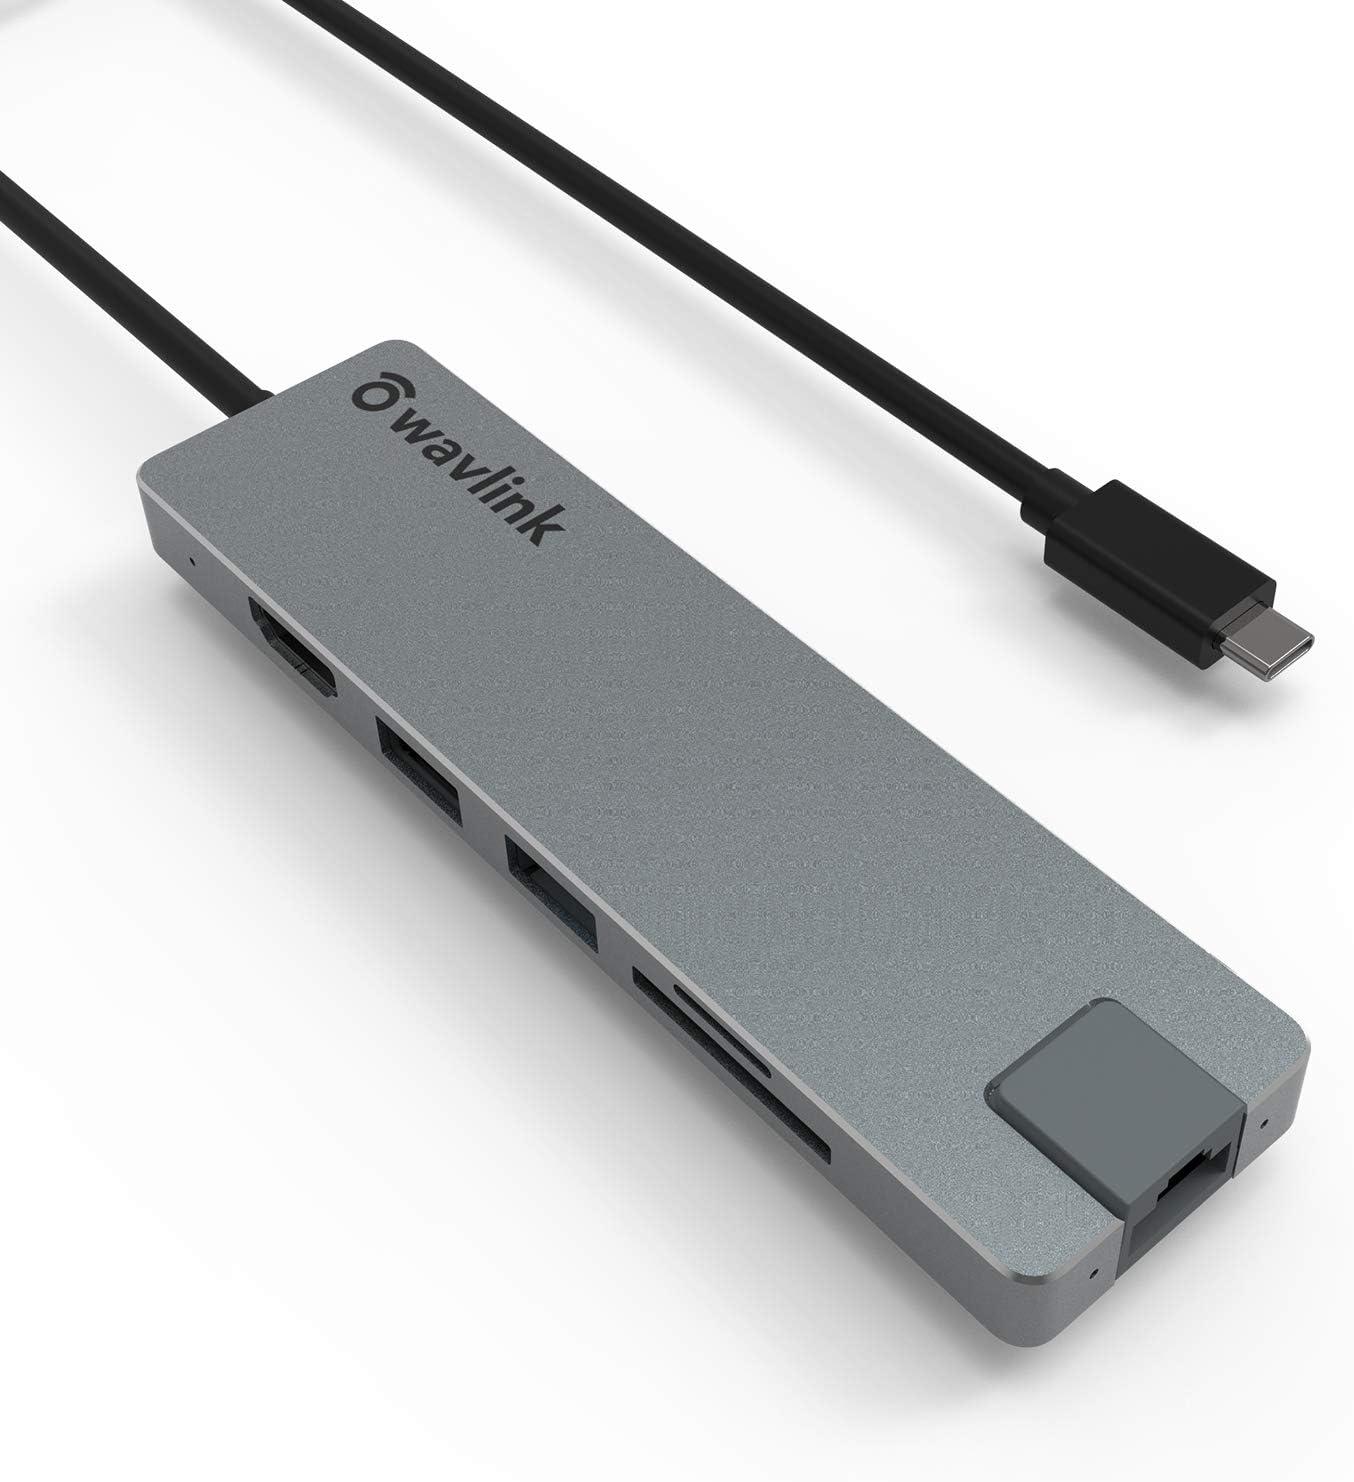 USB C Hub, WAVLINK Portable USB Hub with 100W Charging & 4K HDMI, Slim USB C Adapter for Laptop with Gigabit Ethernet, SD/TF Card Reader, 2xUSB 3.0, 1xUSB C, Support MacBook, Flash Drive, Mobile HDD